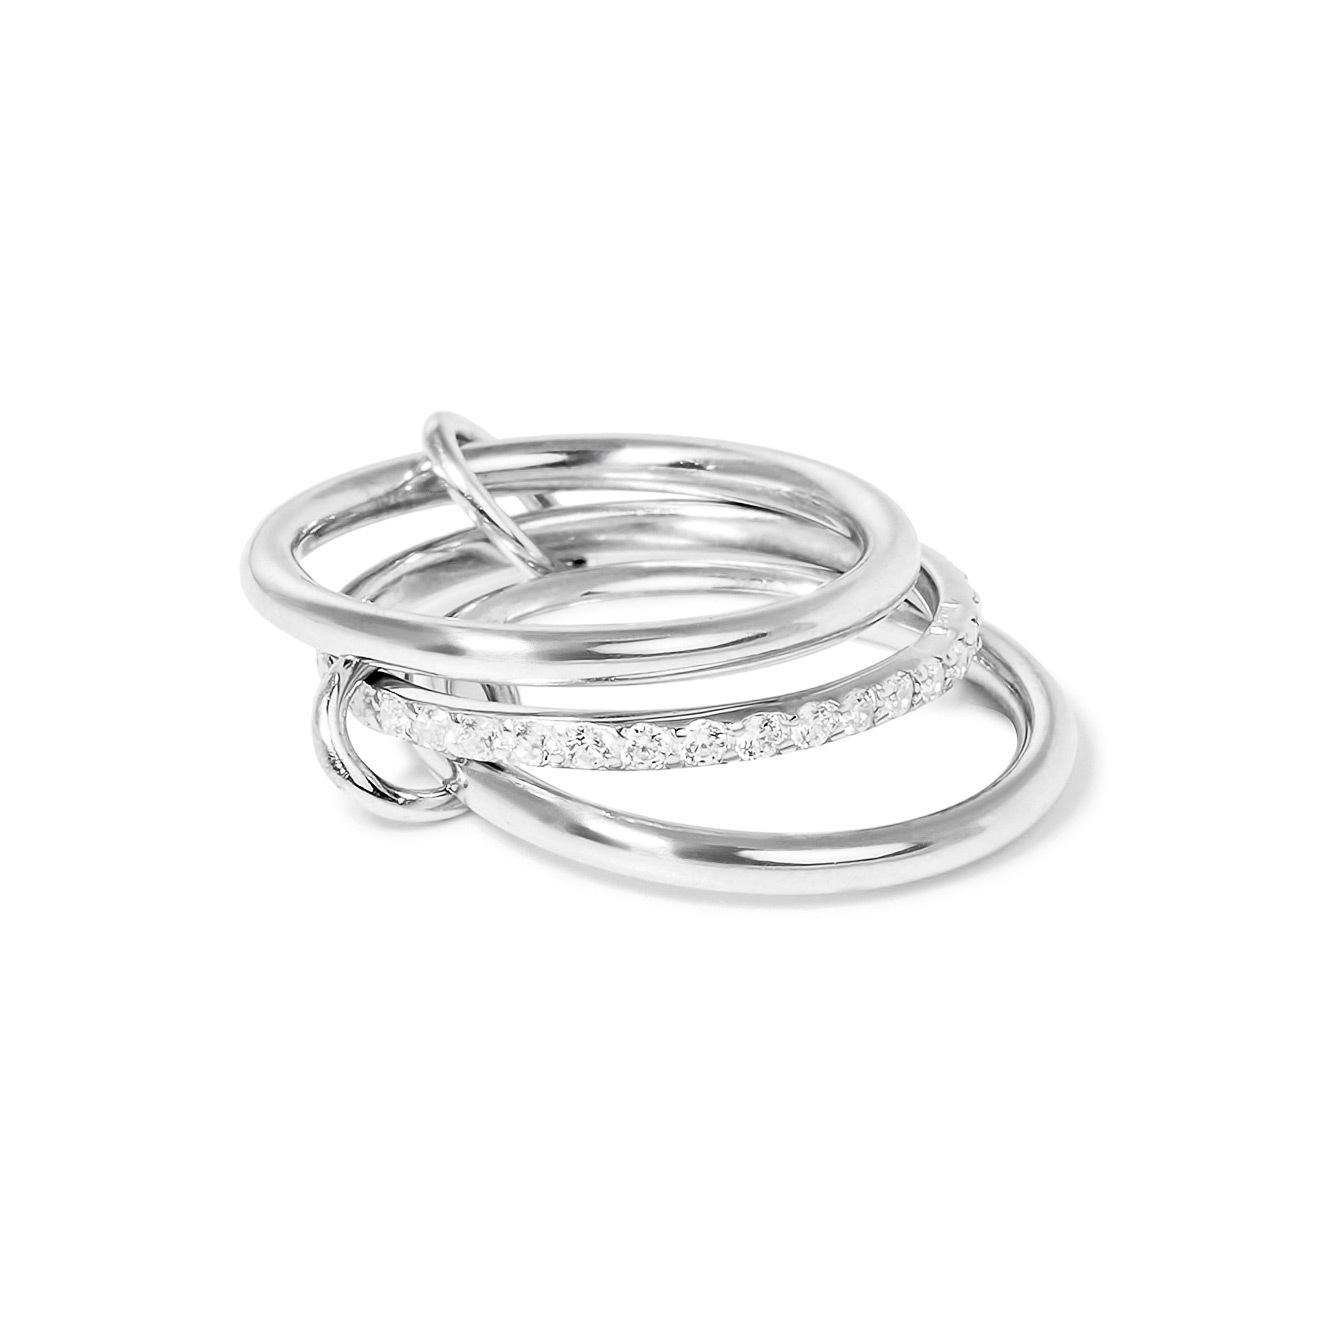 Фото - Wanna?Be! Кольцо «Trinity» из серебра с фианитами кольцо змейка с фианитами из серебра